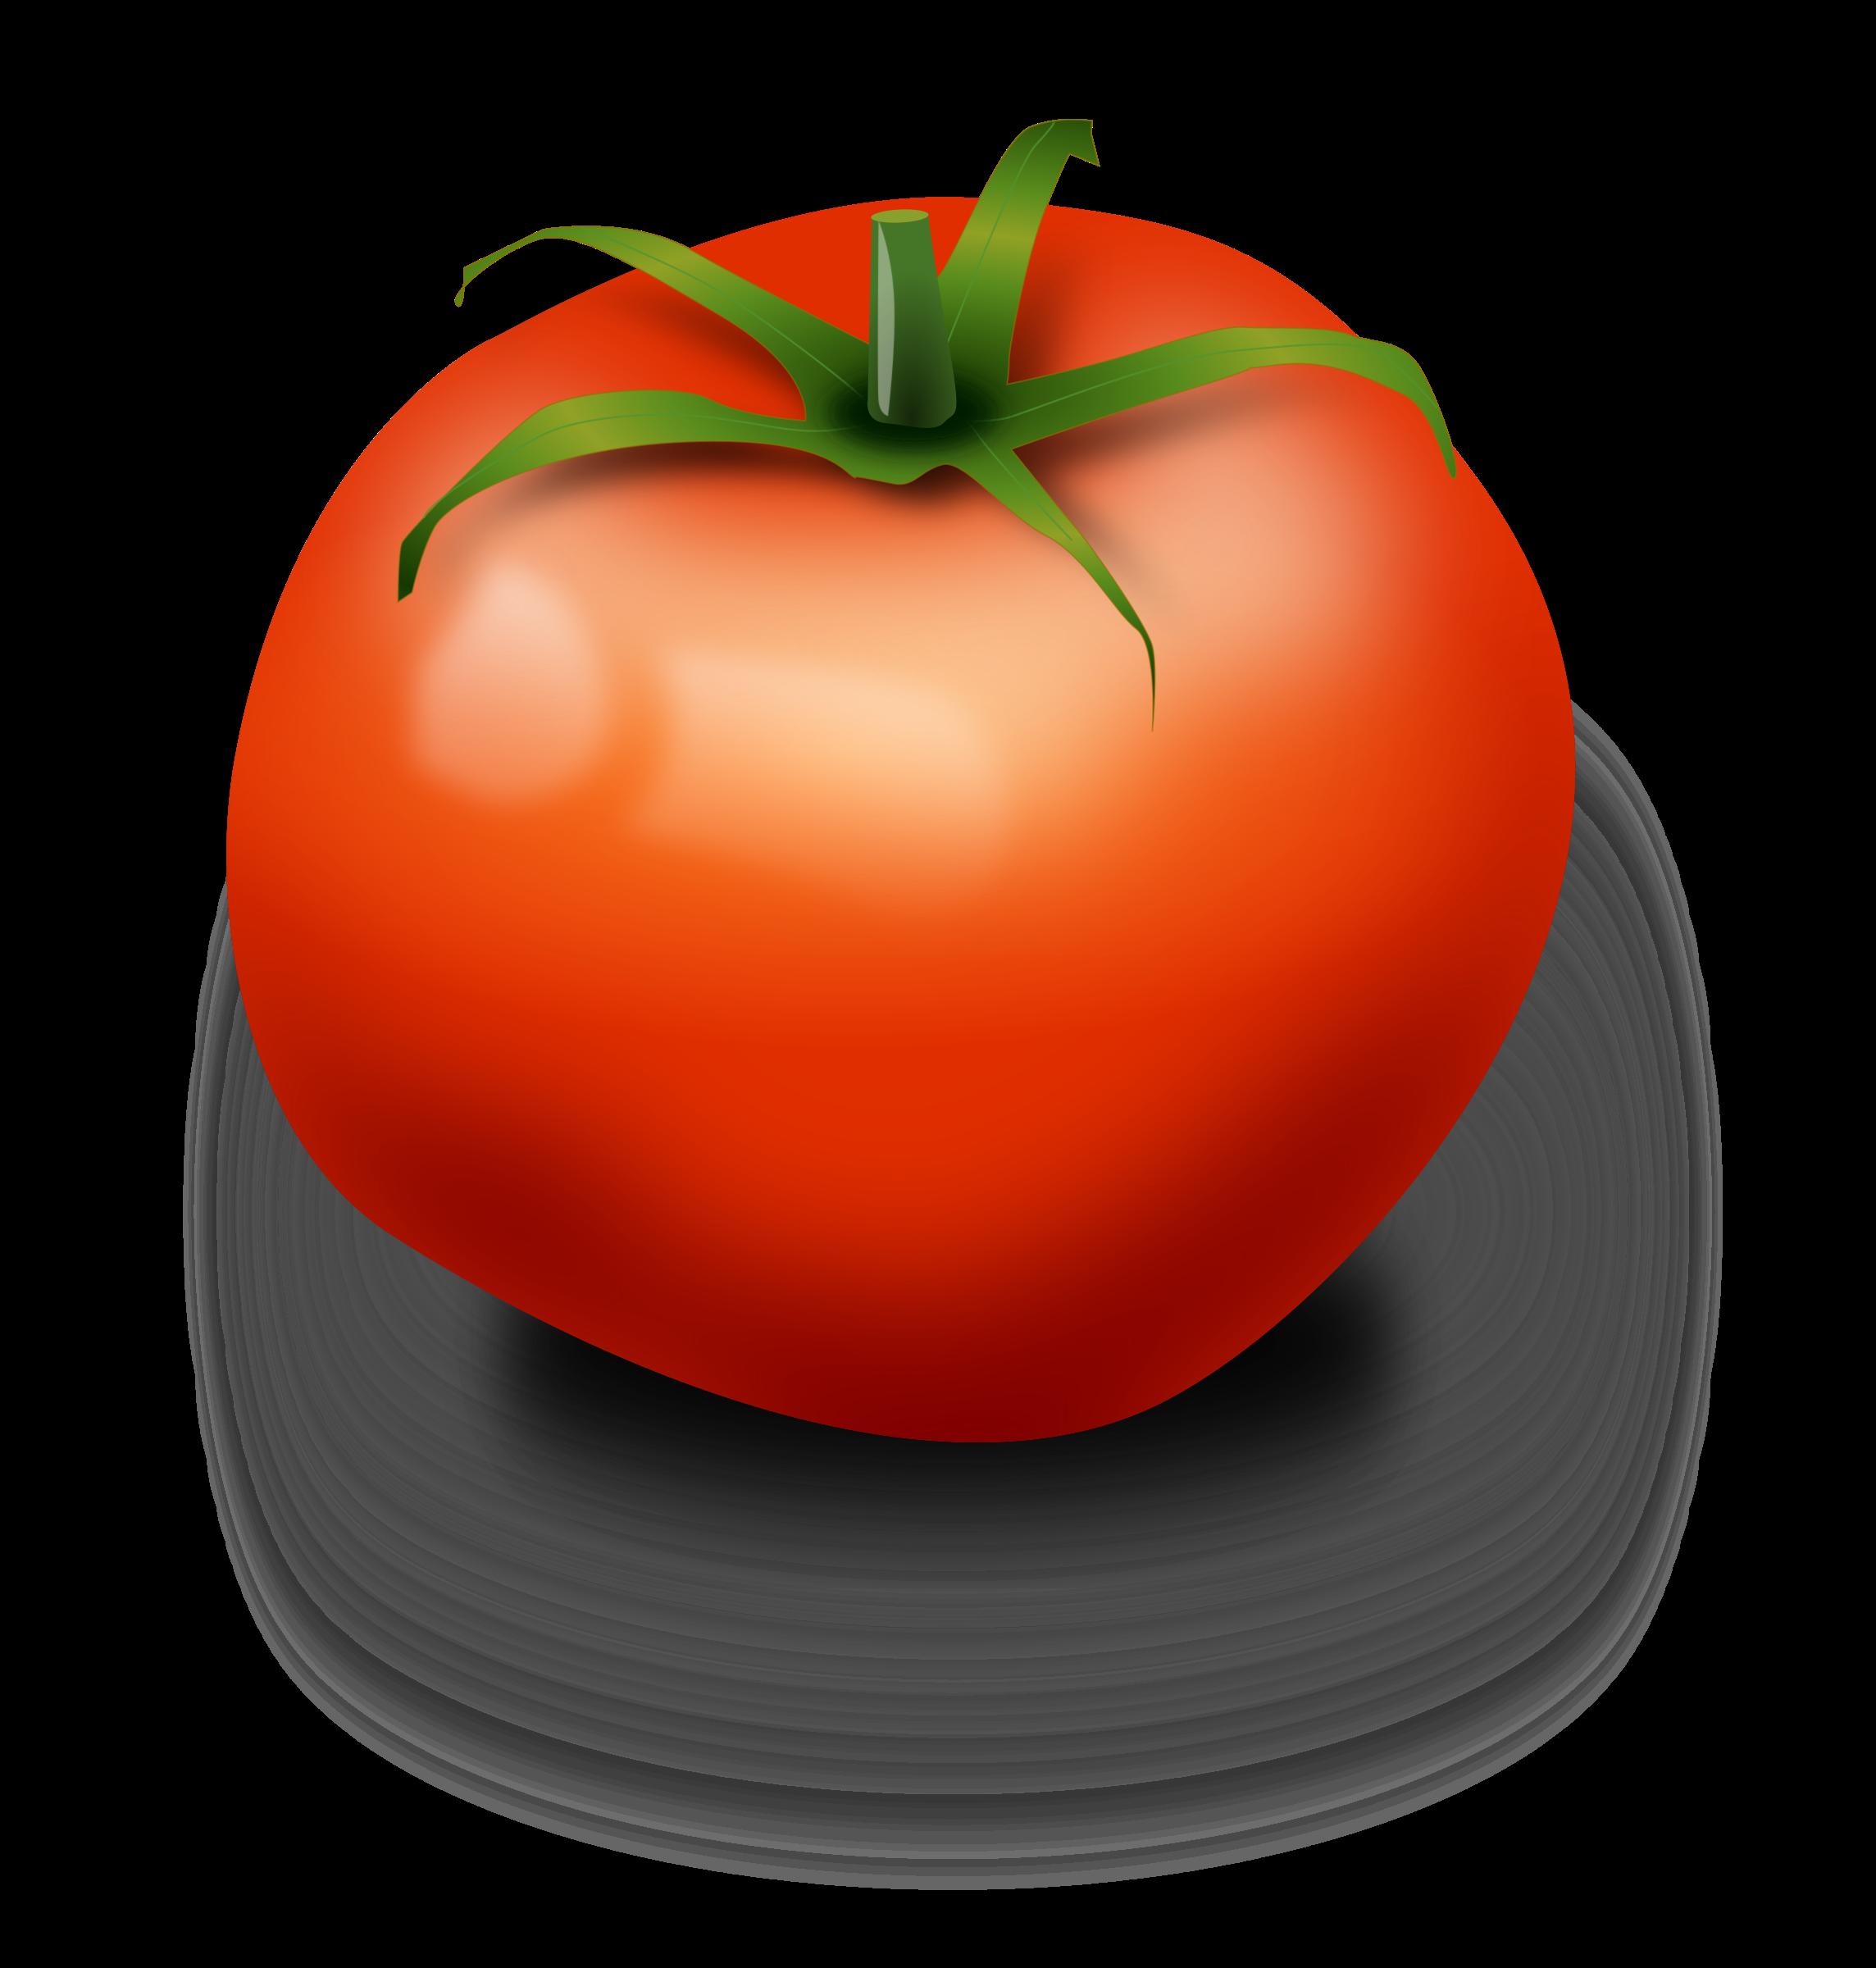 Tomato. Tomatoes clipart local